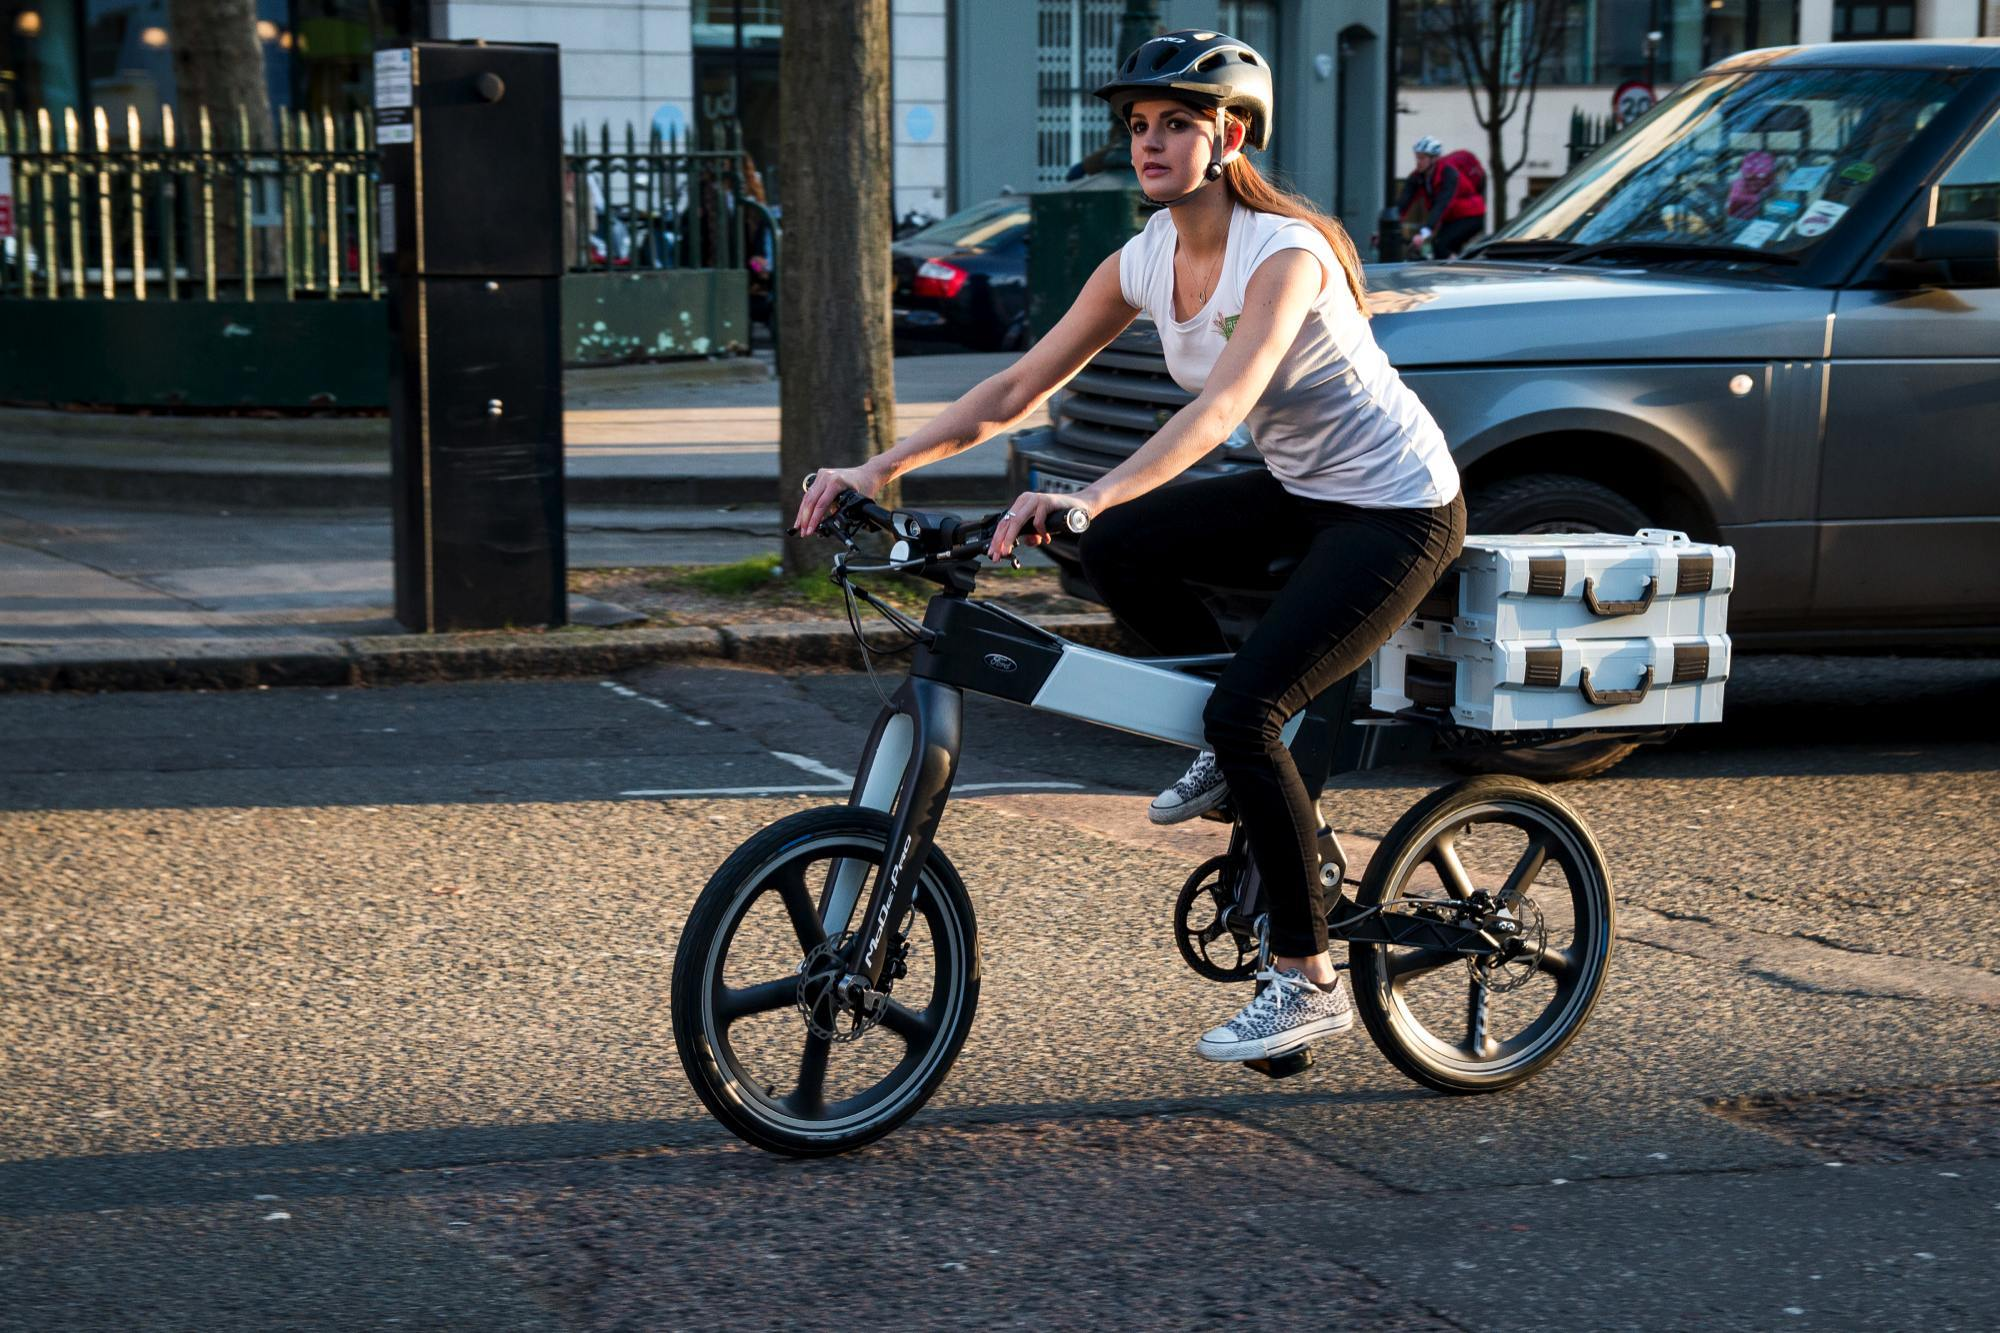 Foto de Ford Mode:Me y Mode:Pro, bicicletas eléctricas (16/16)